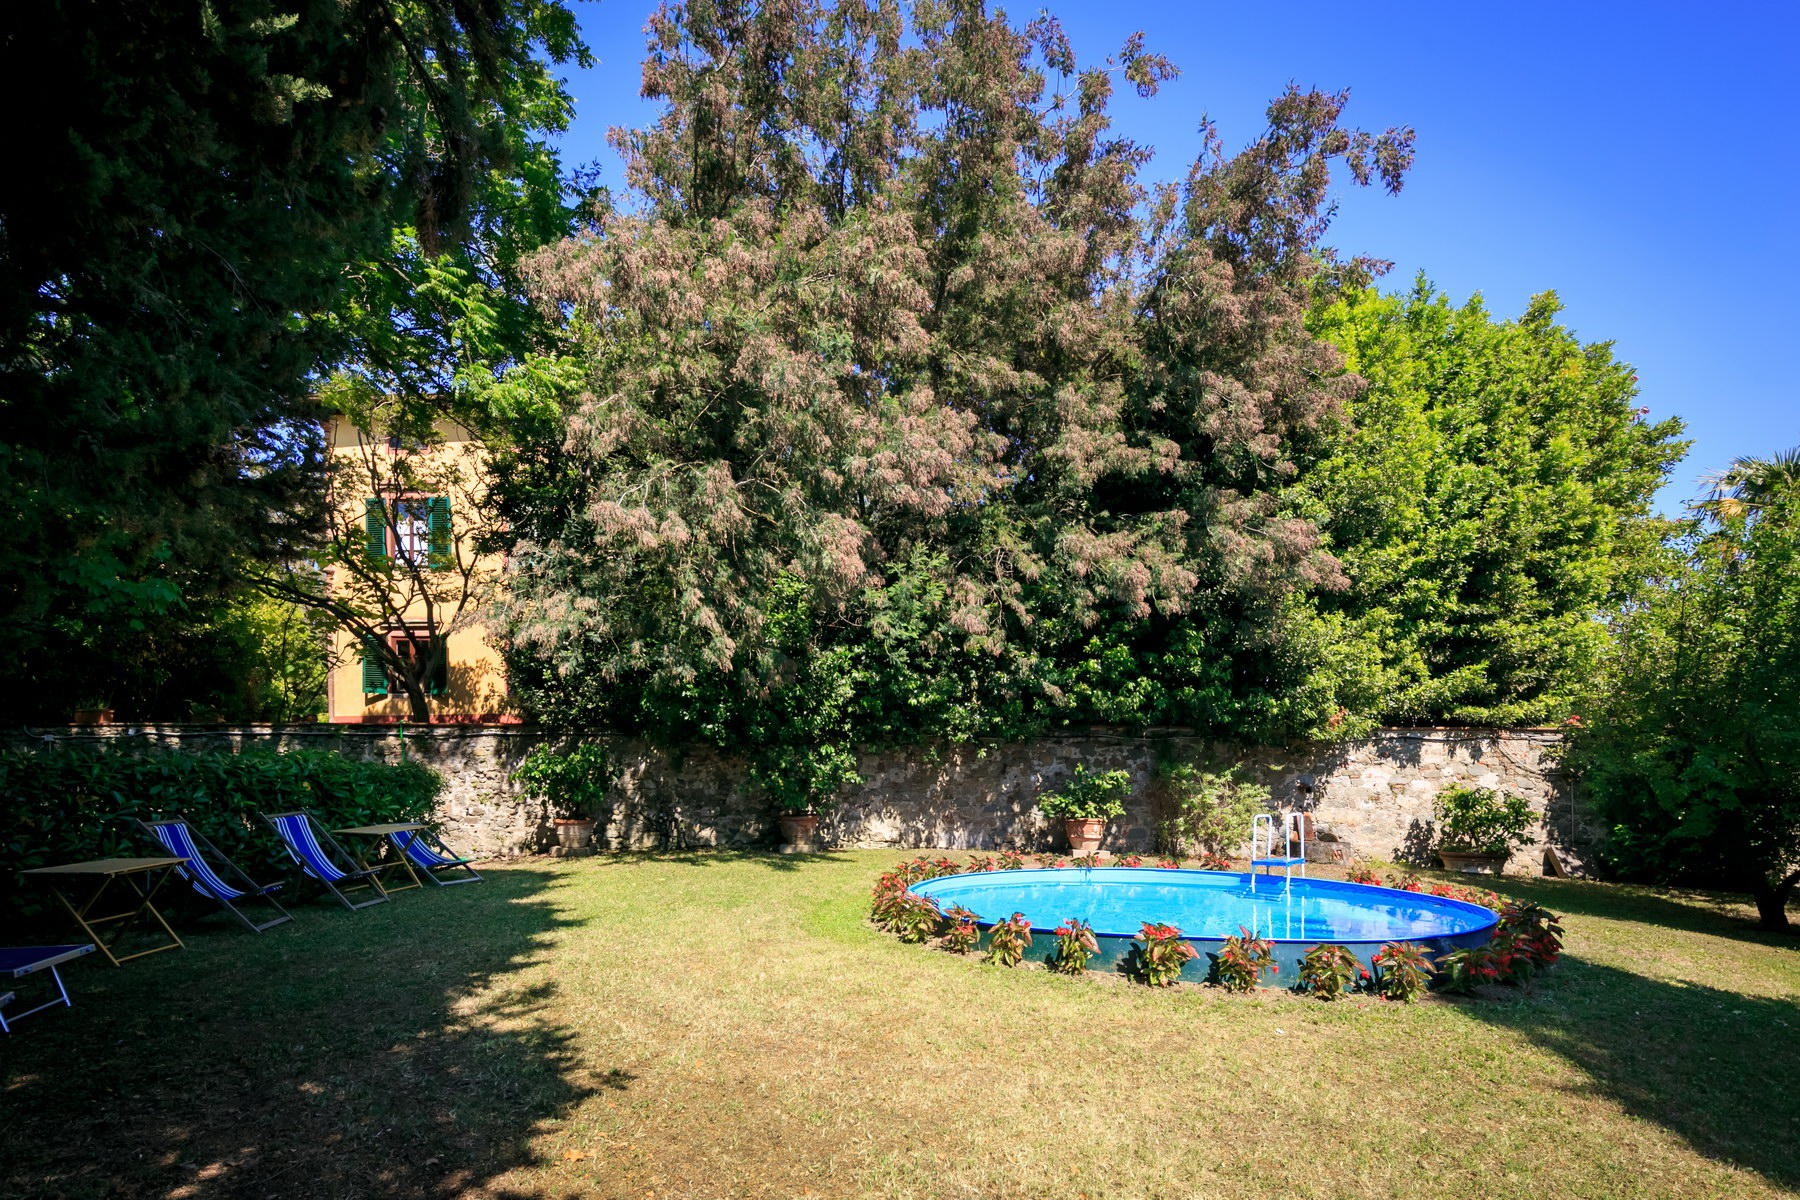 Villa in Vendita a Capannori: 5 locali, 570 mq - Foto 25